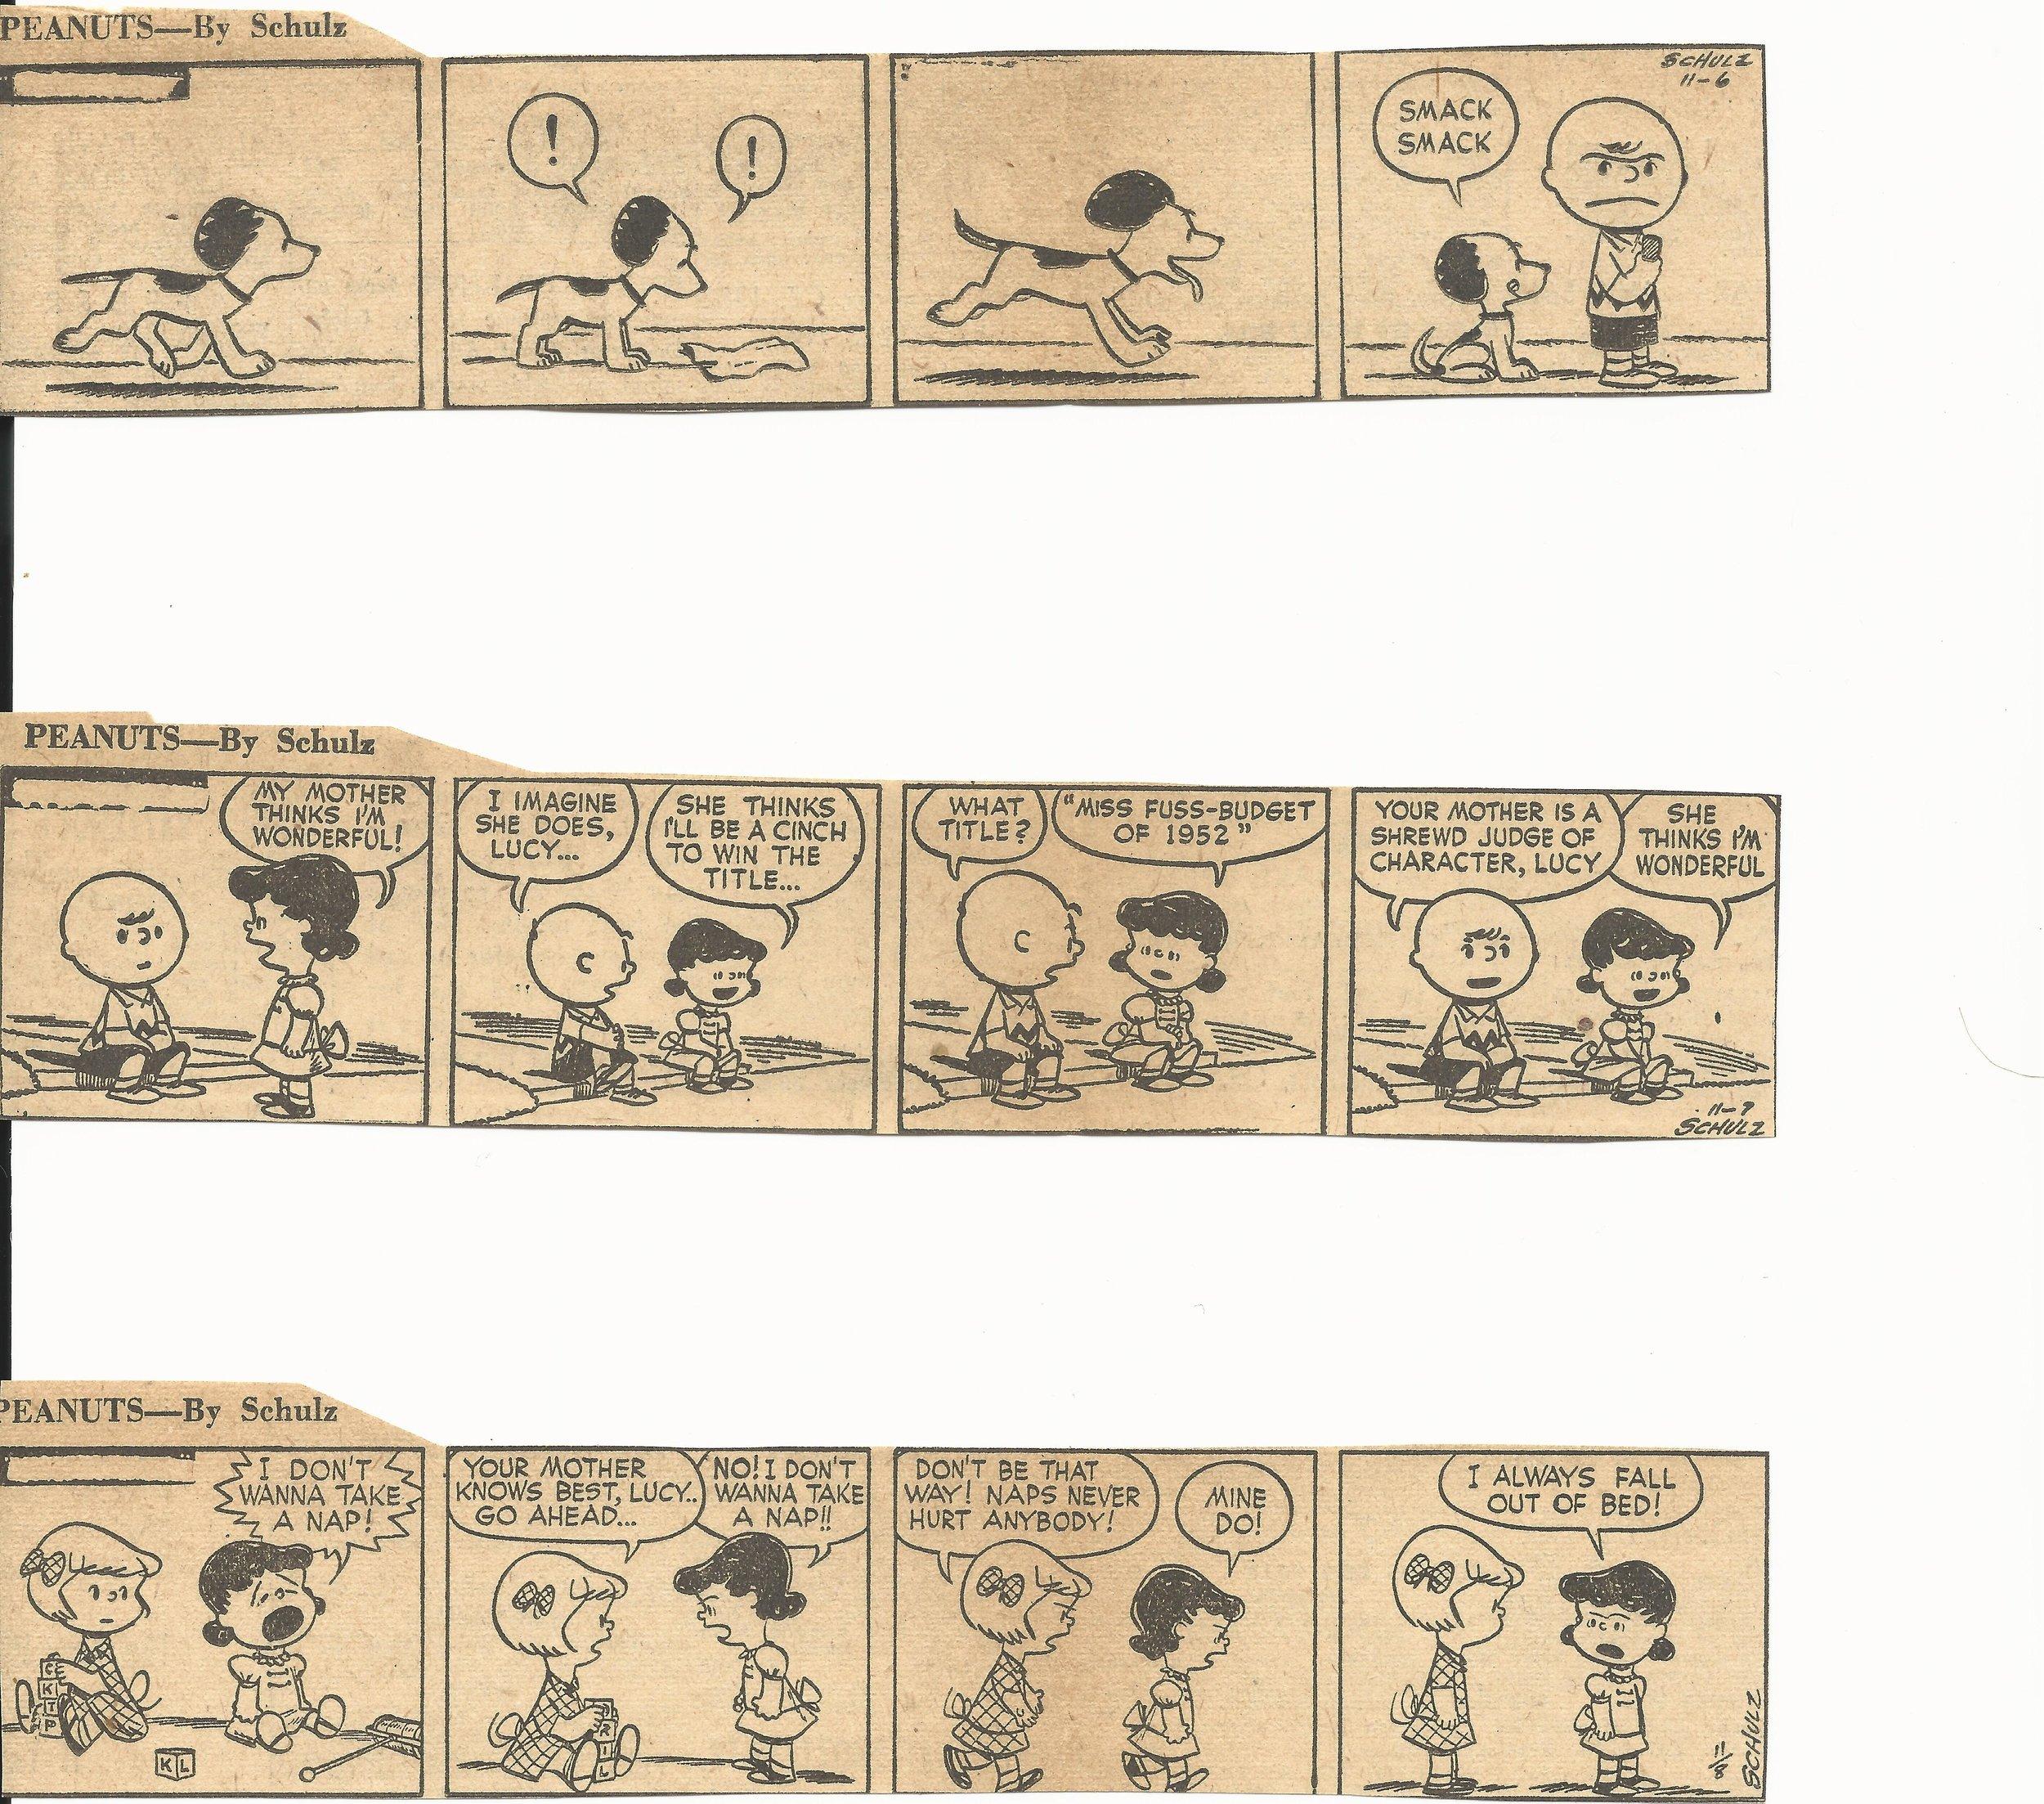 5. Nov. 8, 1952 (Oma)_Page_7.jpg